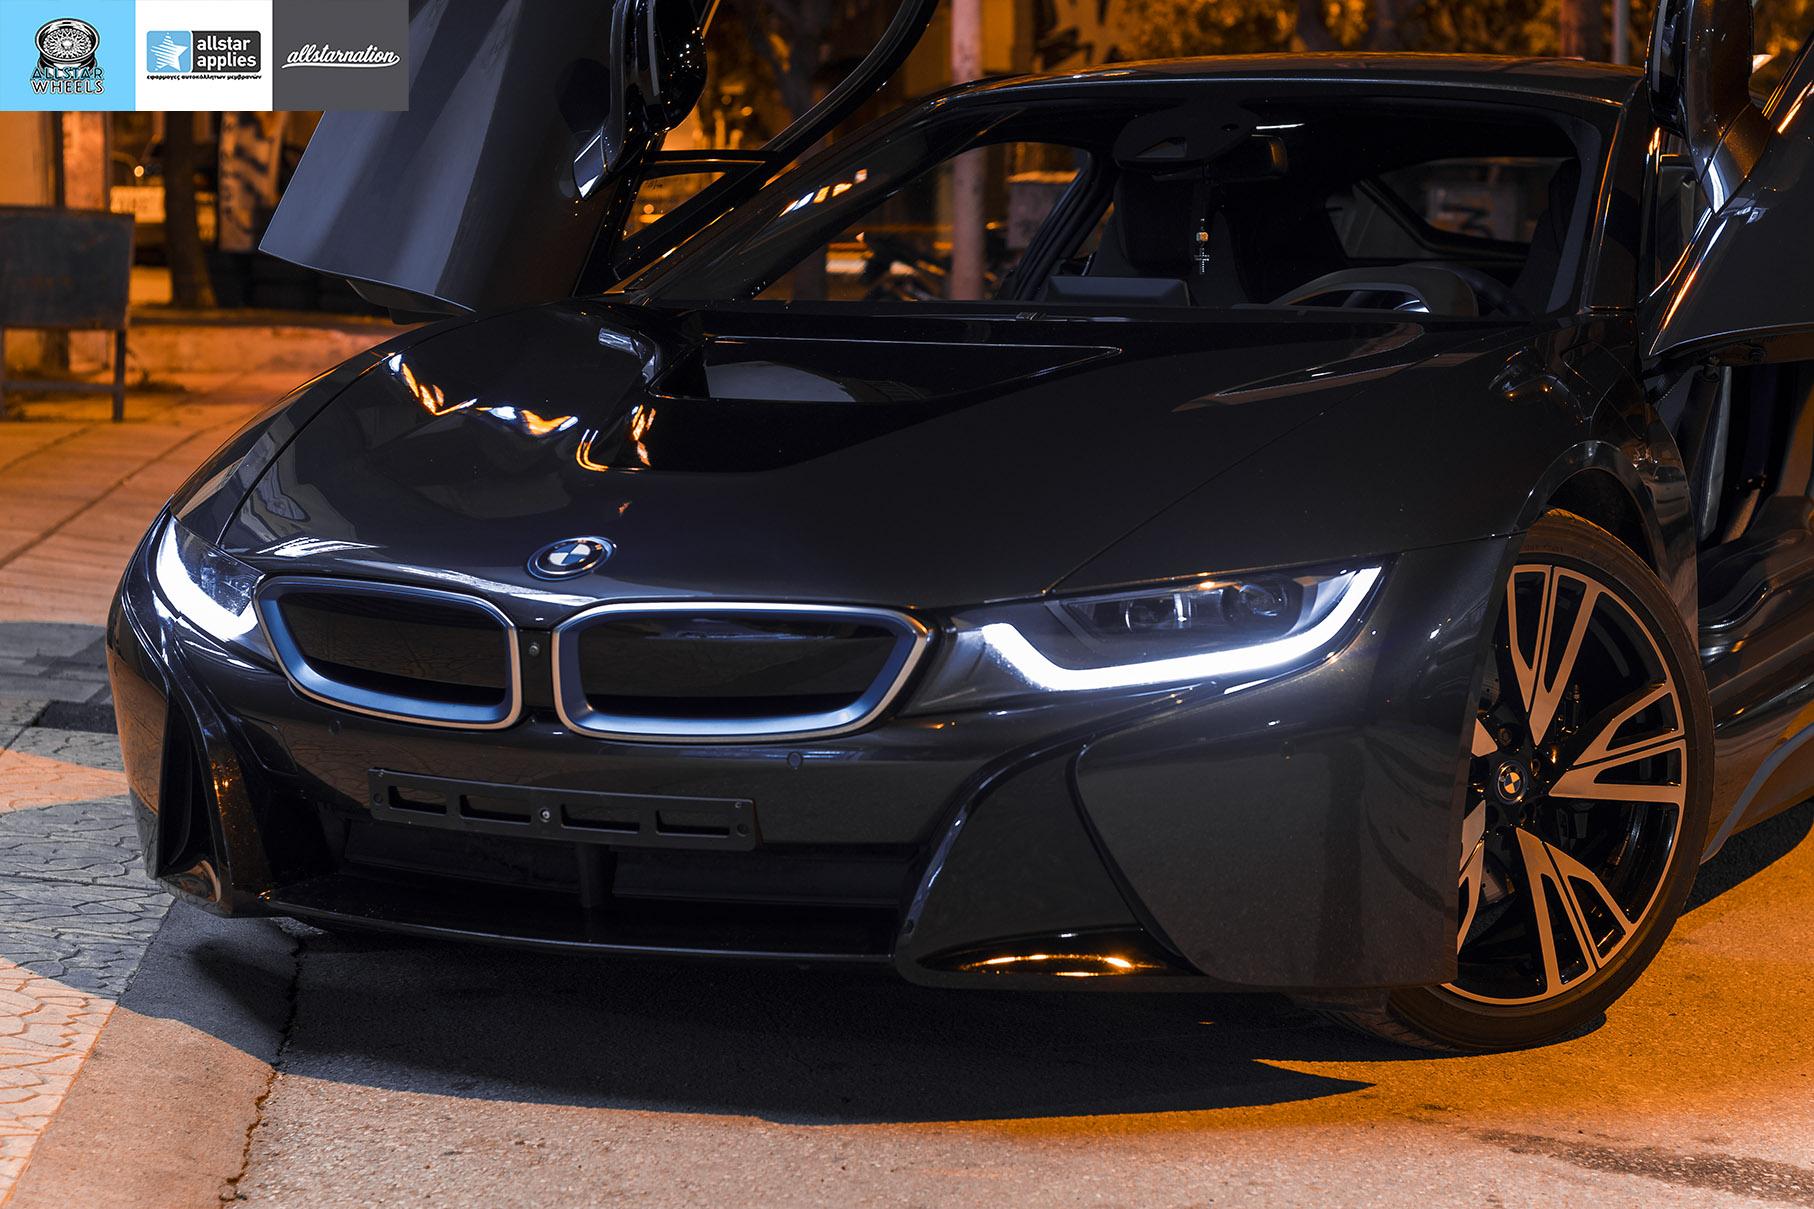 BMW I8 – Μεμβράνες προστασίας χρώματος – Μπροστινό πακέτο (6)